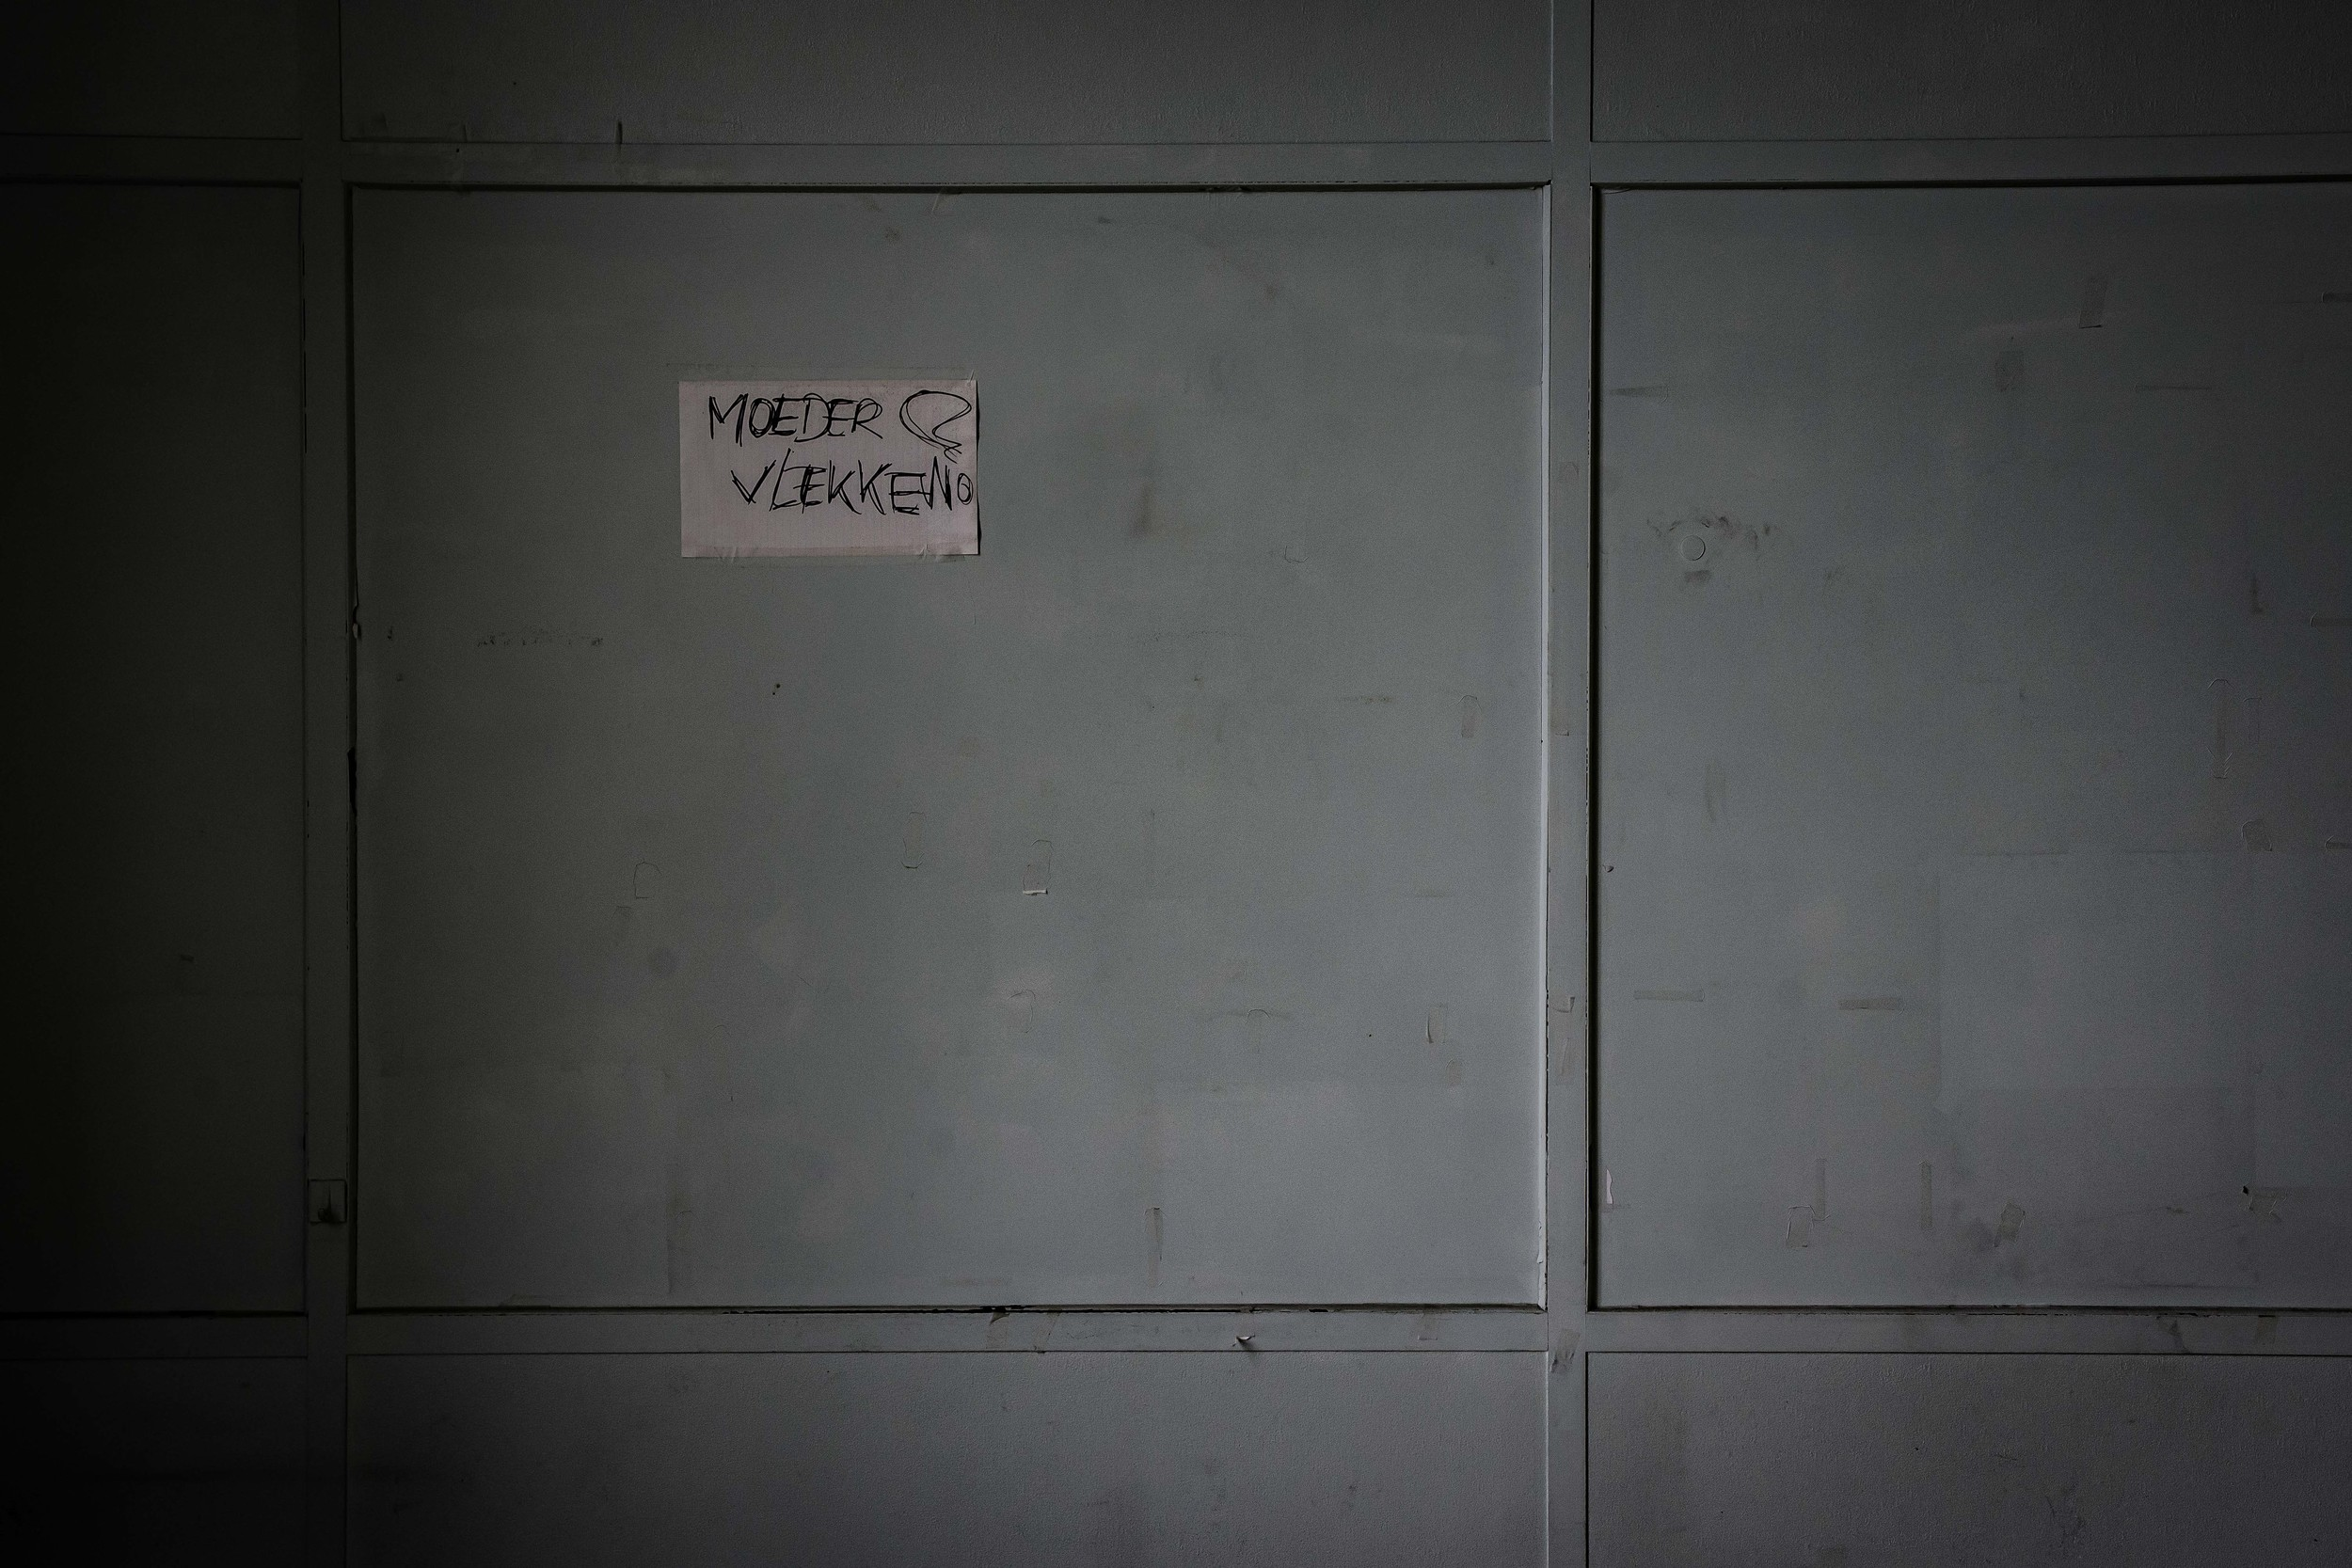 viewfinder-eigenzinnige-fotografie-urbex-vergane-glorie-oude-papierfabriek-moedervlekken